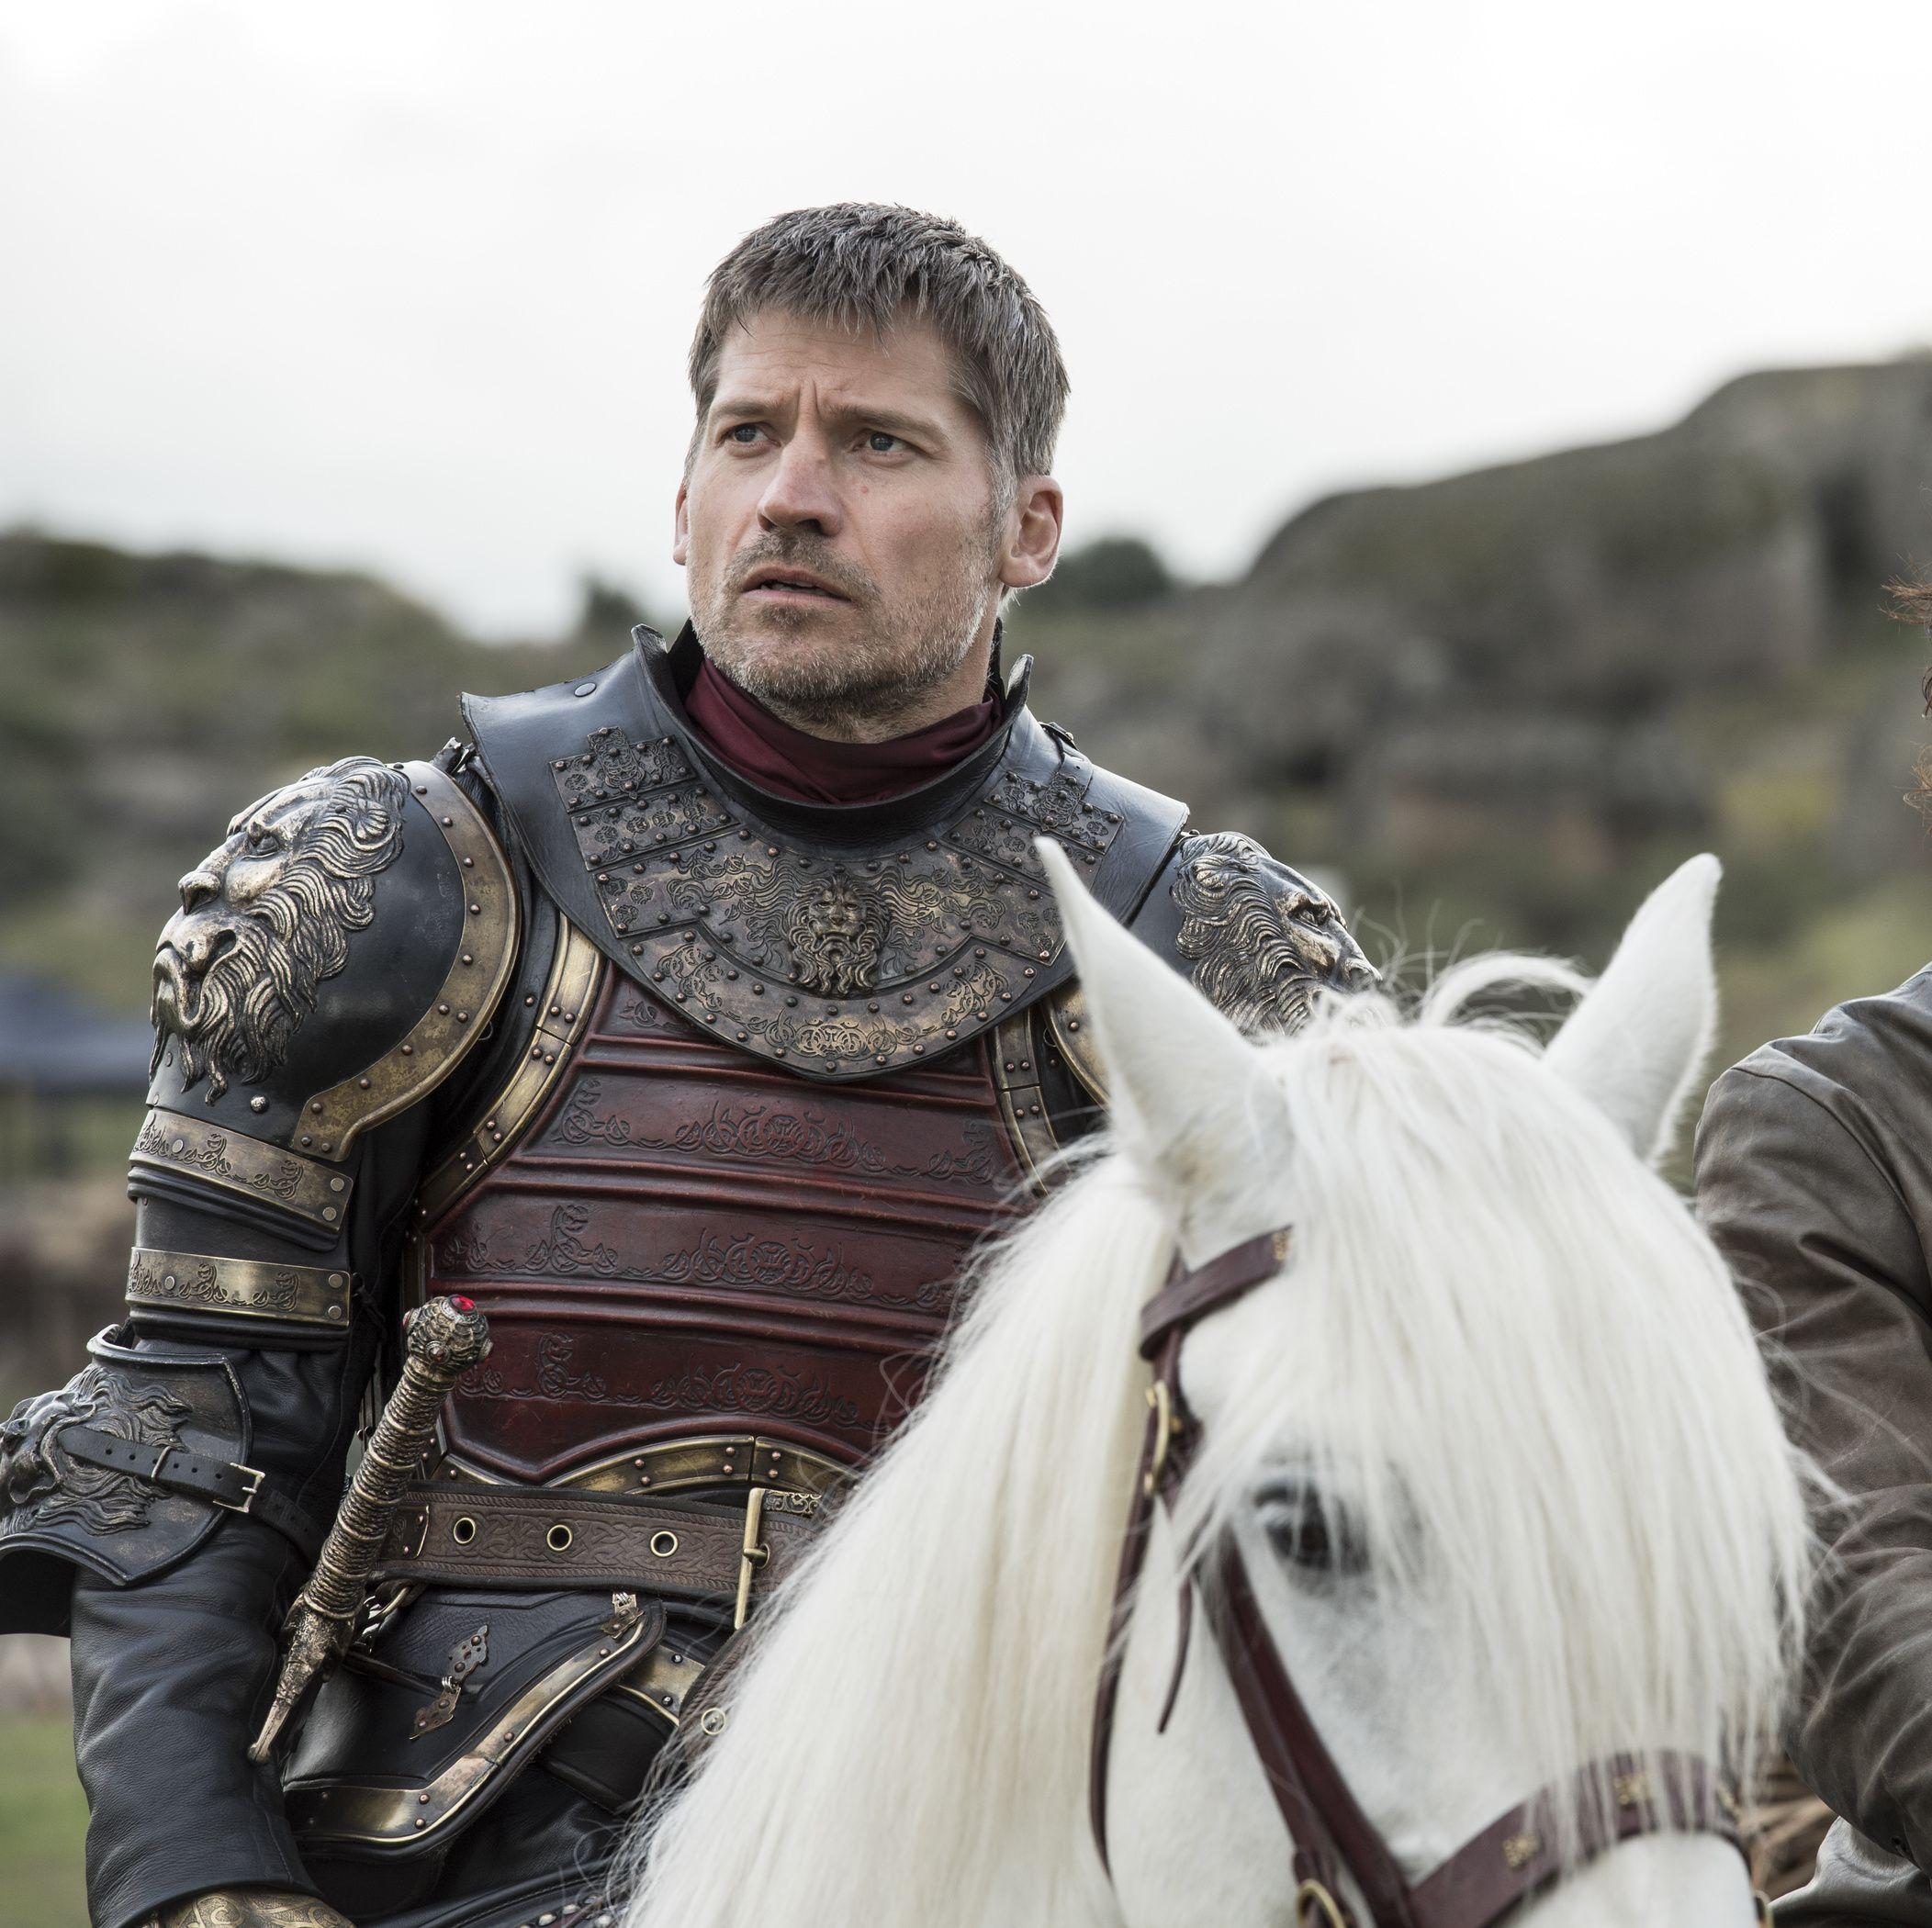 Game of Thrones' Jaime actor hints at surprising team-up in season 8